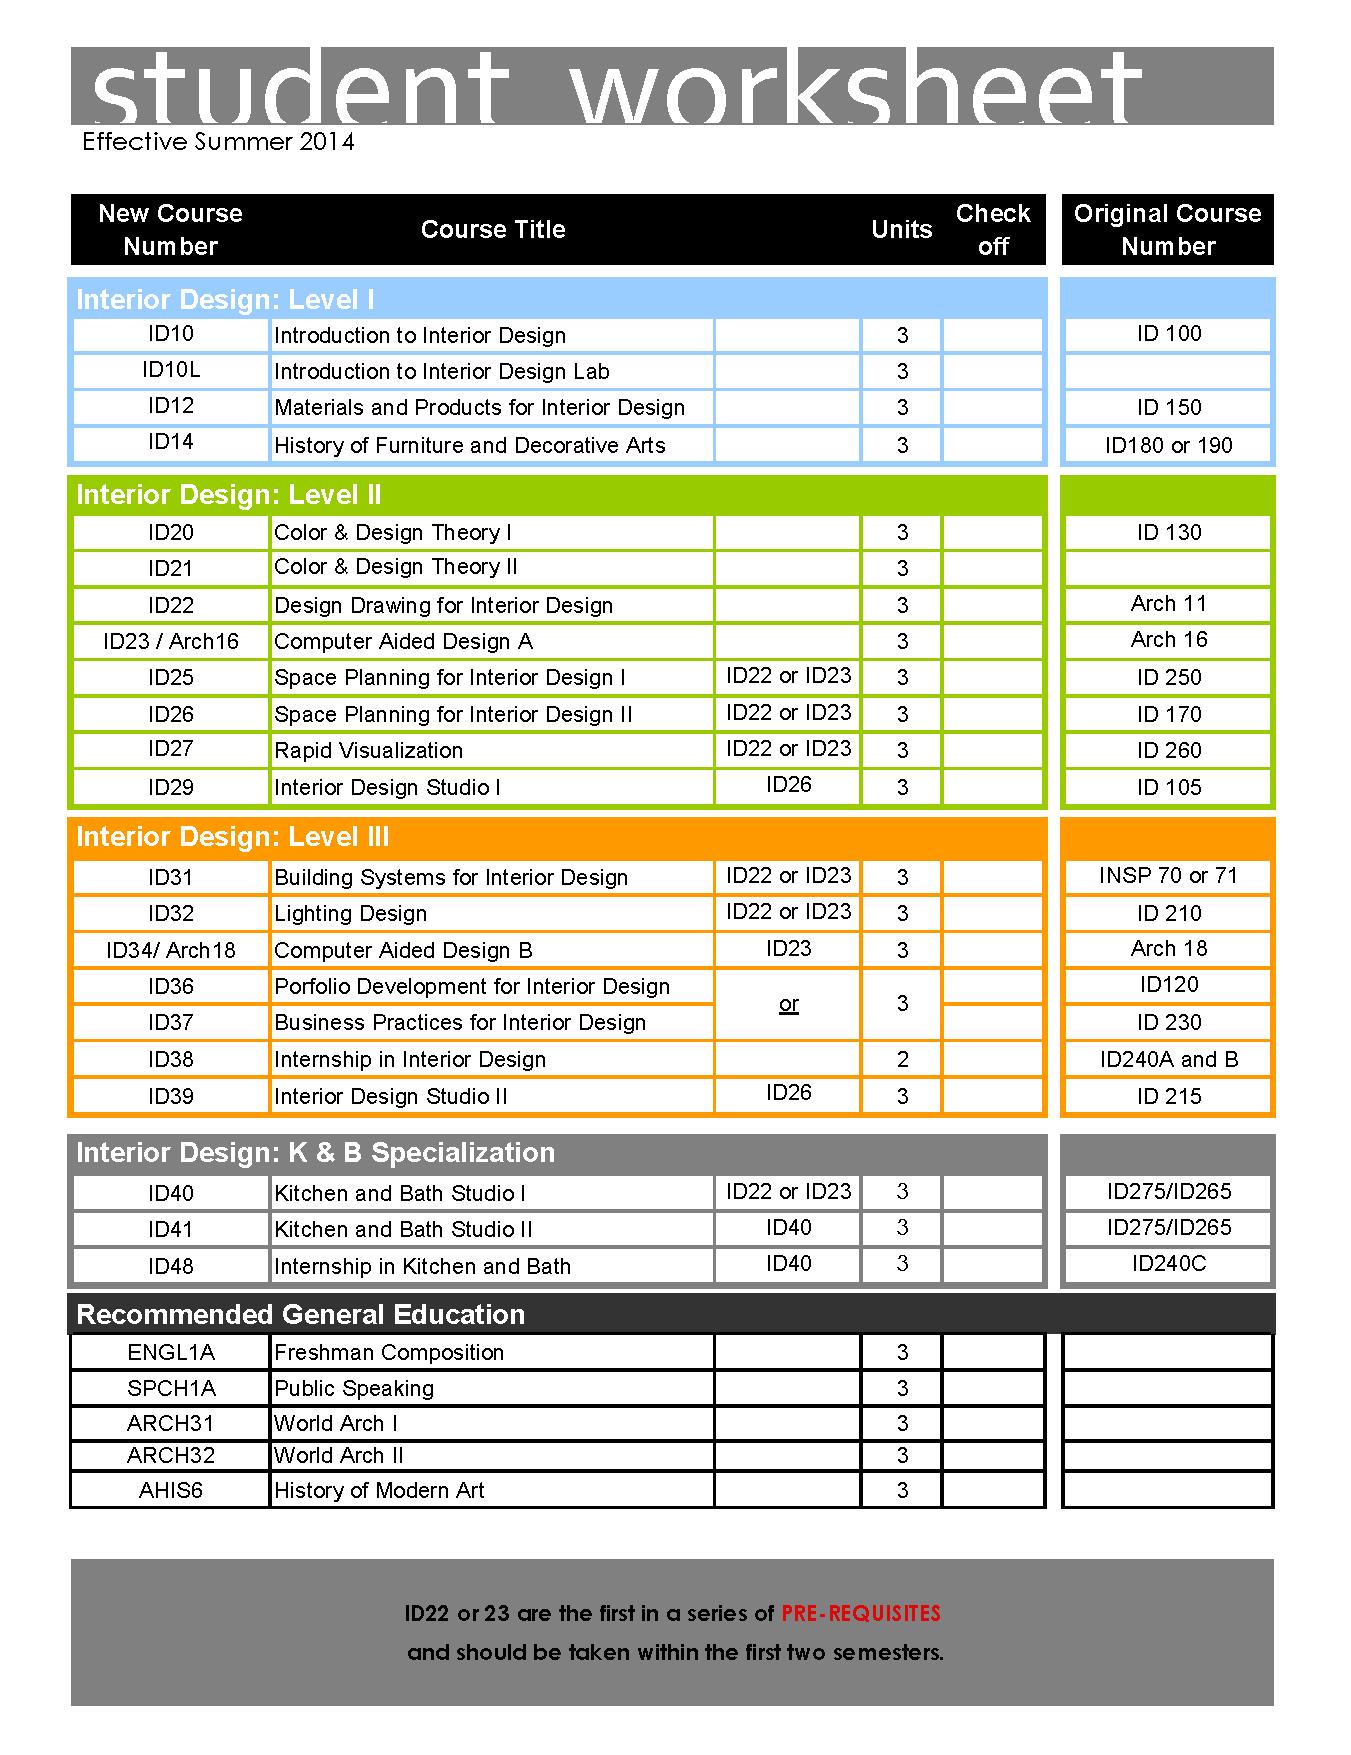 Interior Design Program Planning